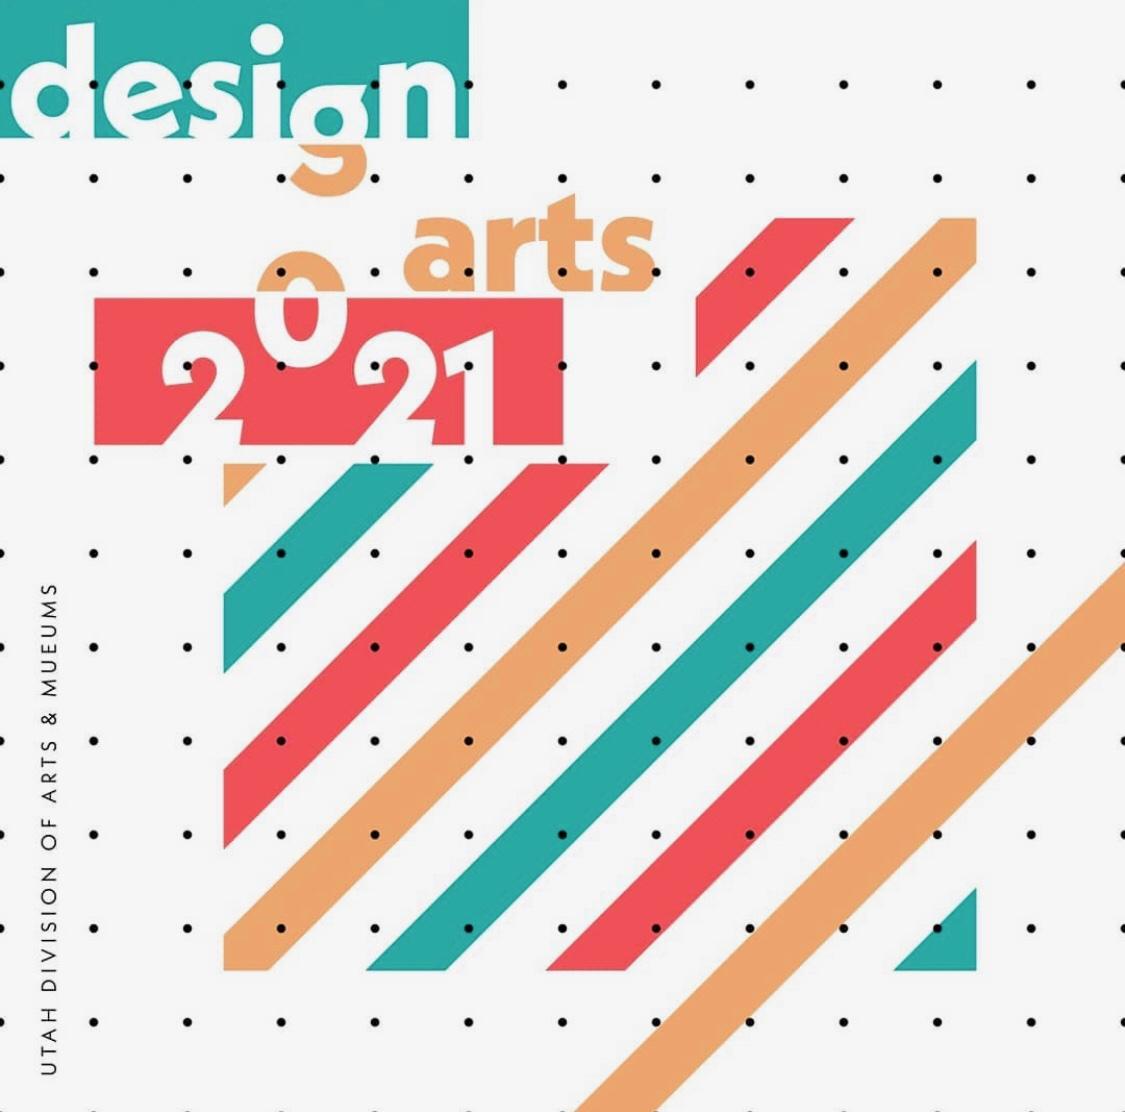 A graphic for Design Arts Utah '21.